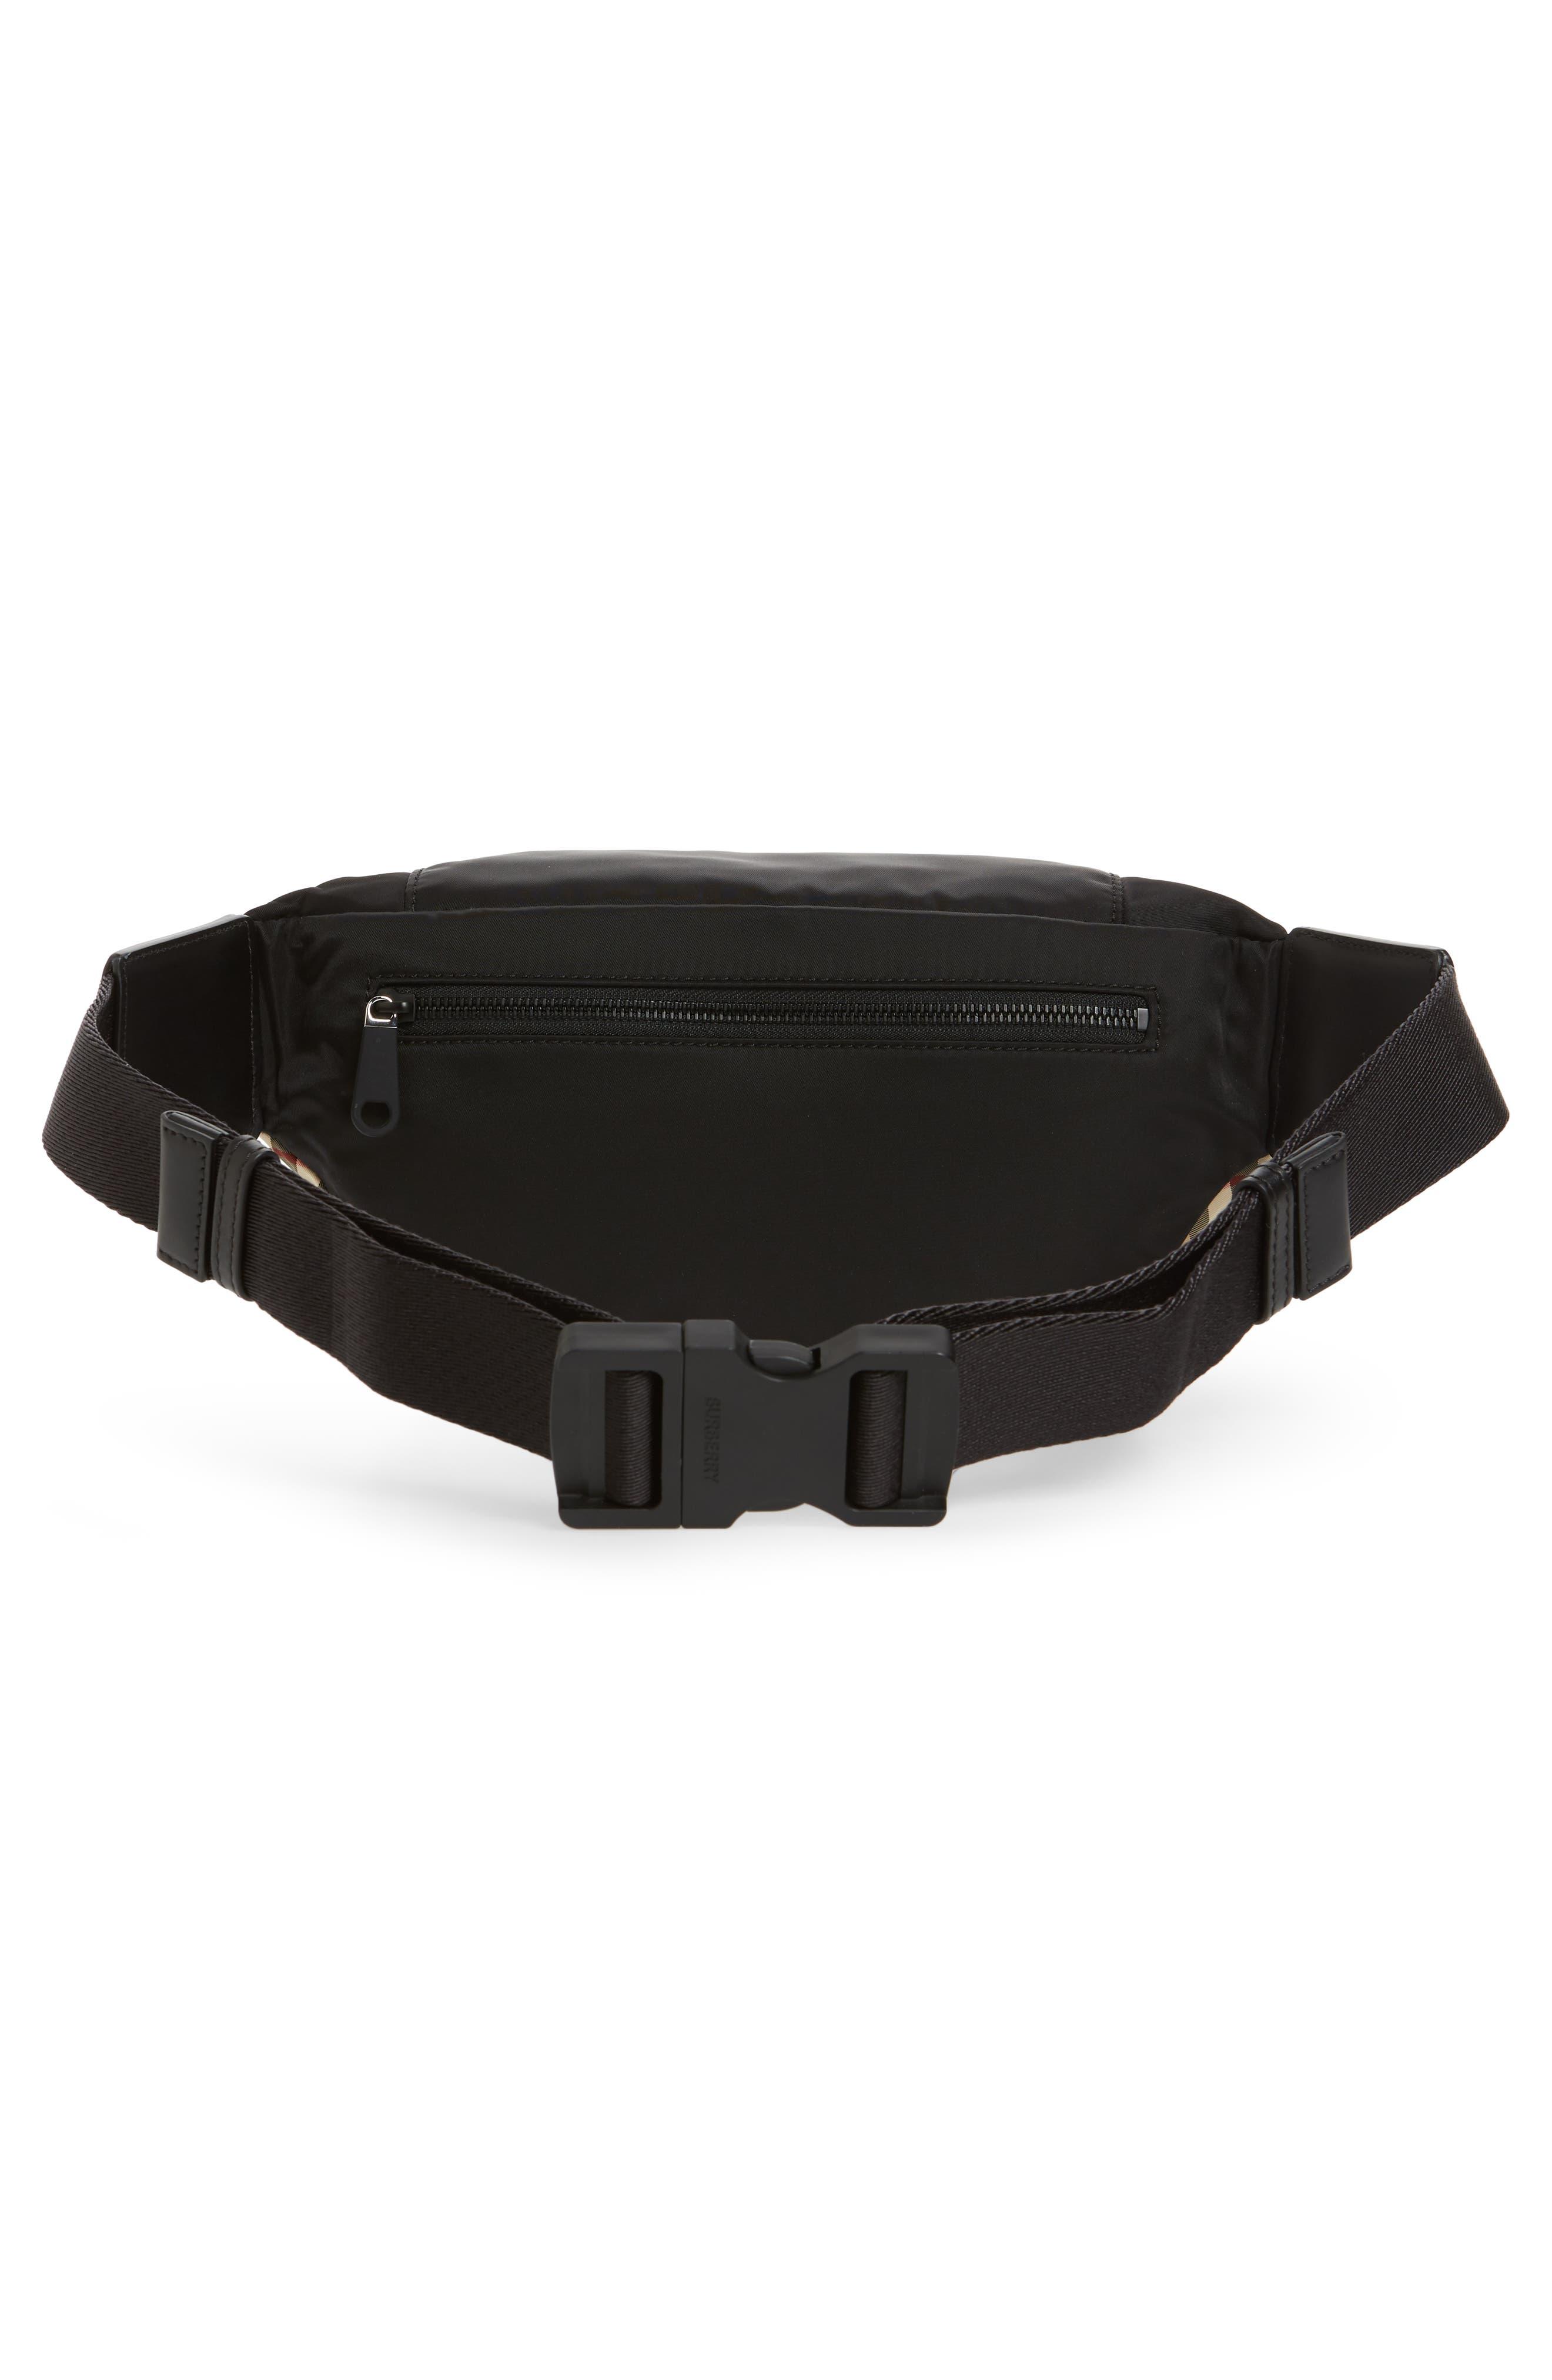 BURBERRY,                             Burberrry Medium Sonny Vintage Check Belt Bag,                             Alternate thumbnail 4, color,                             ARCHIVE BEIGE